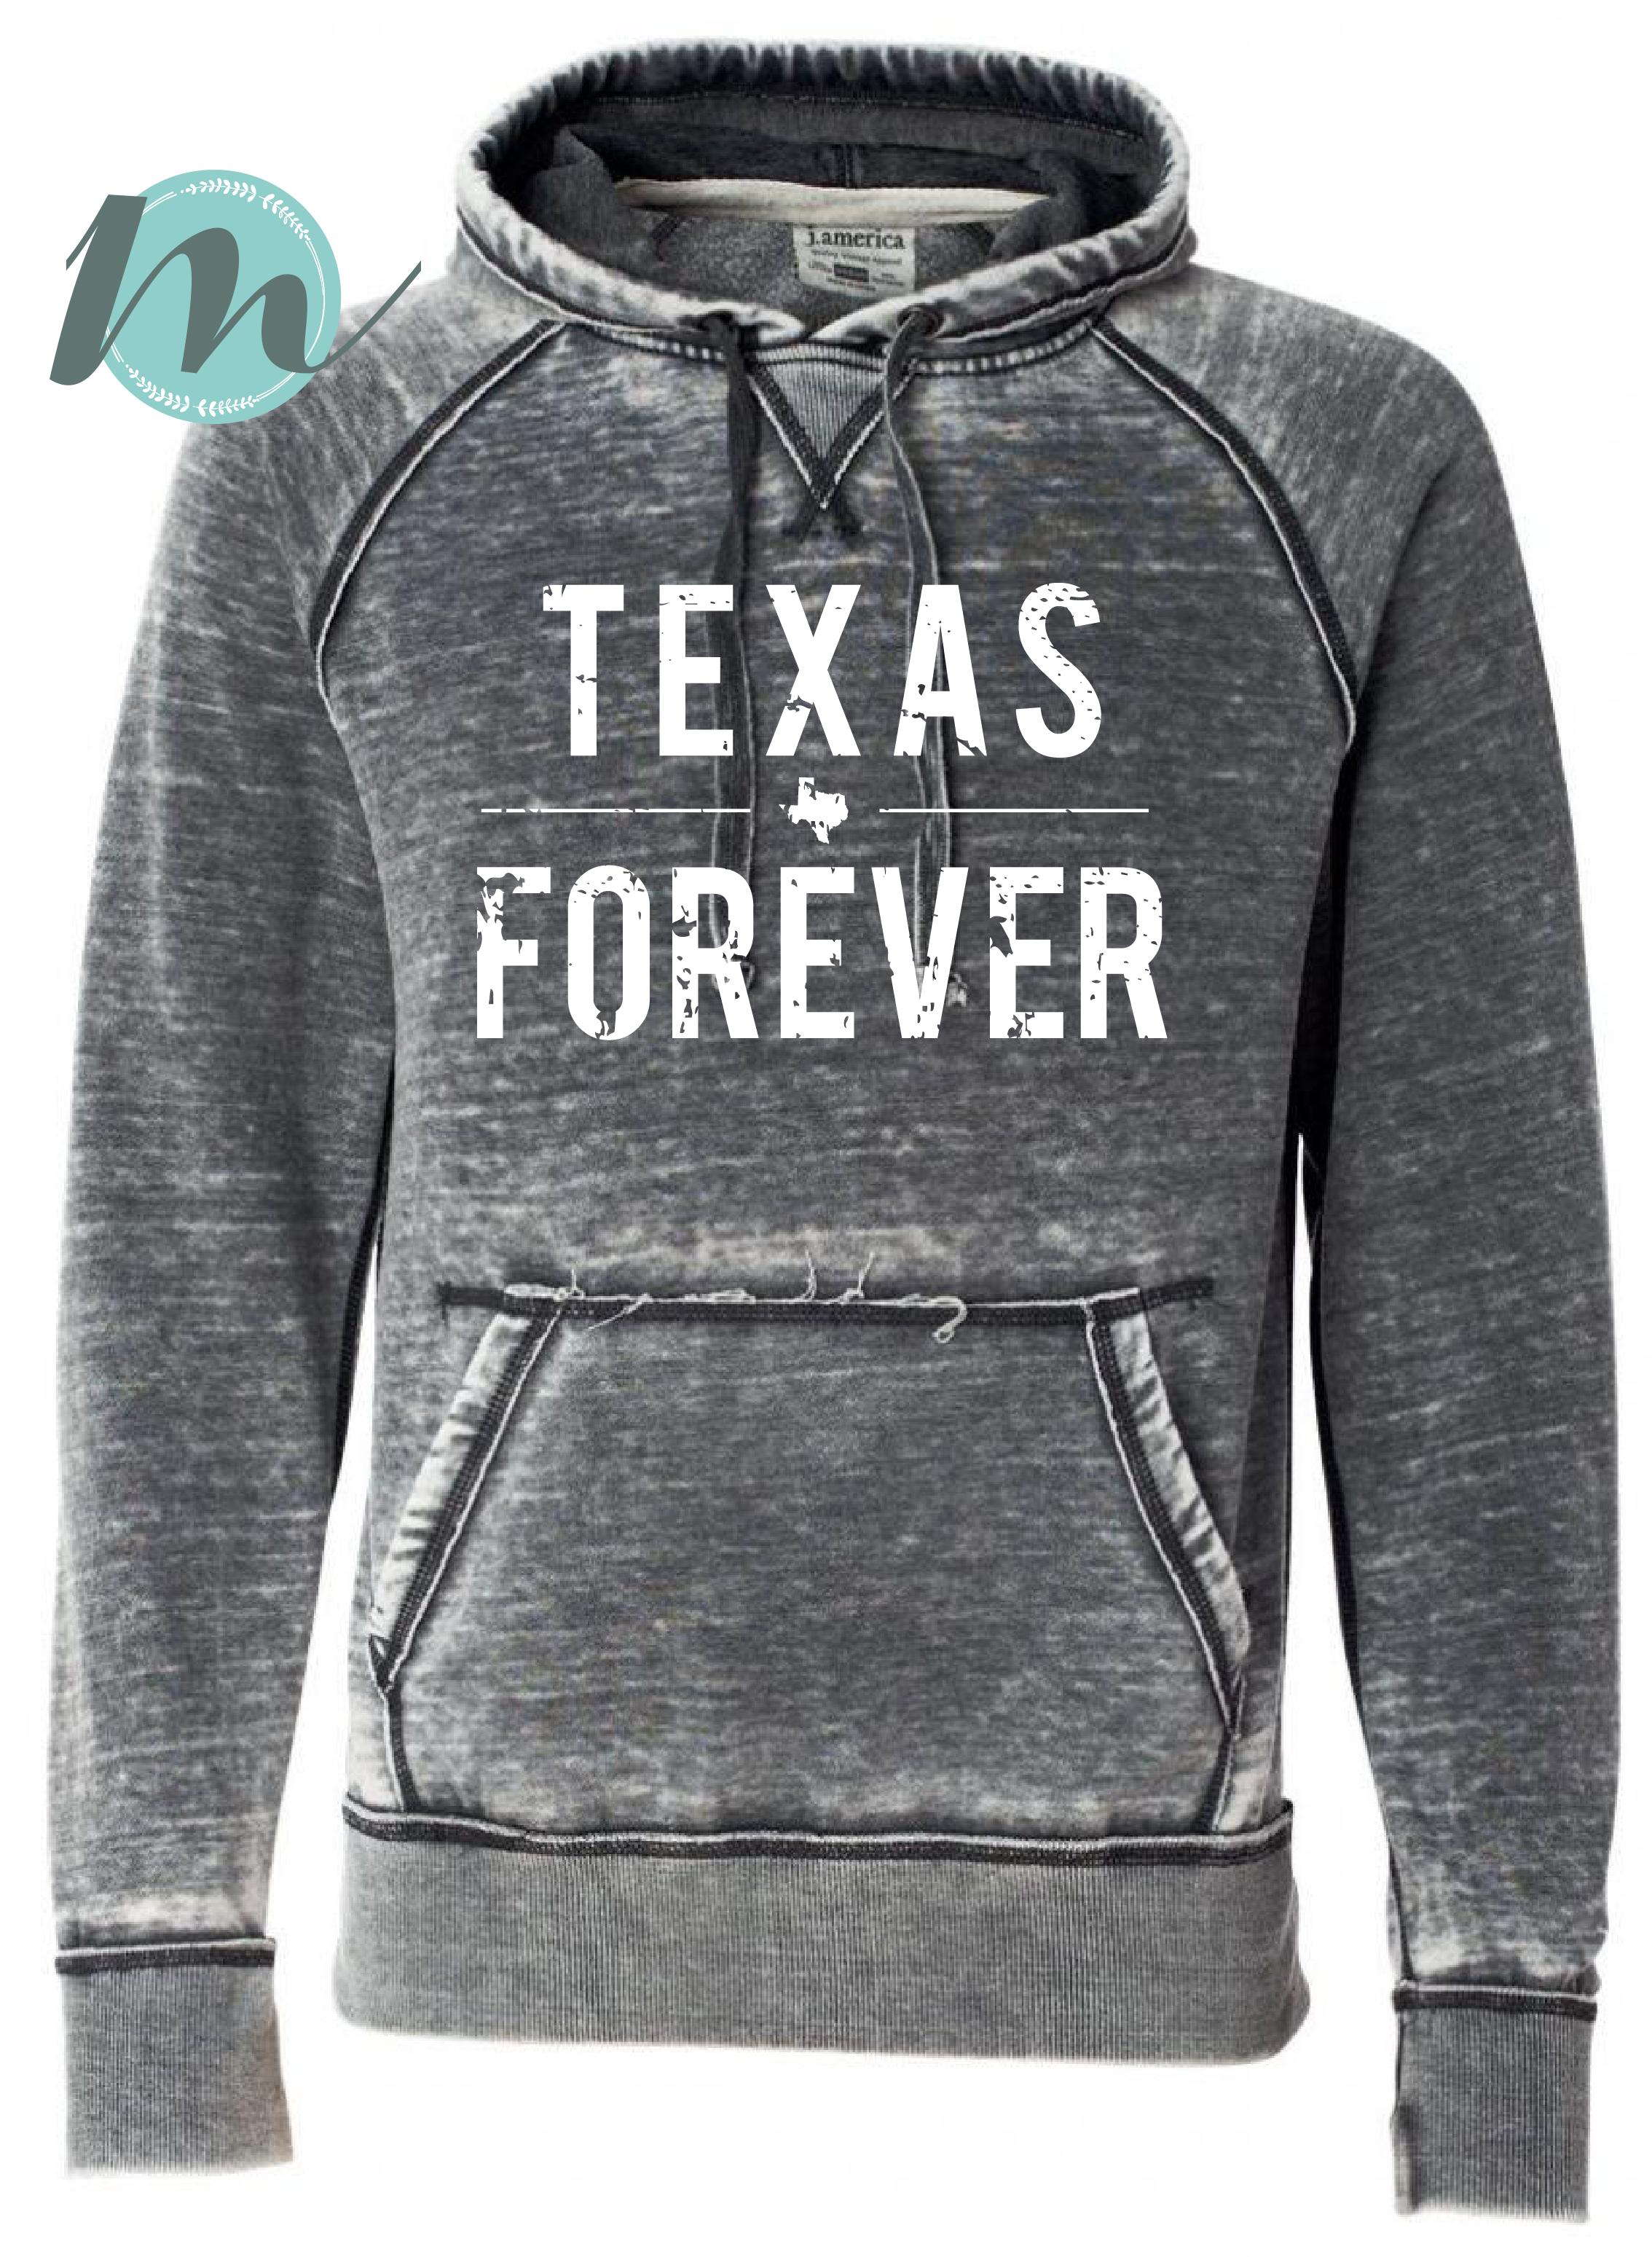 TexasForever_Sweatshirt_Print-01